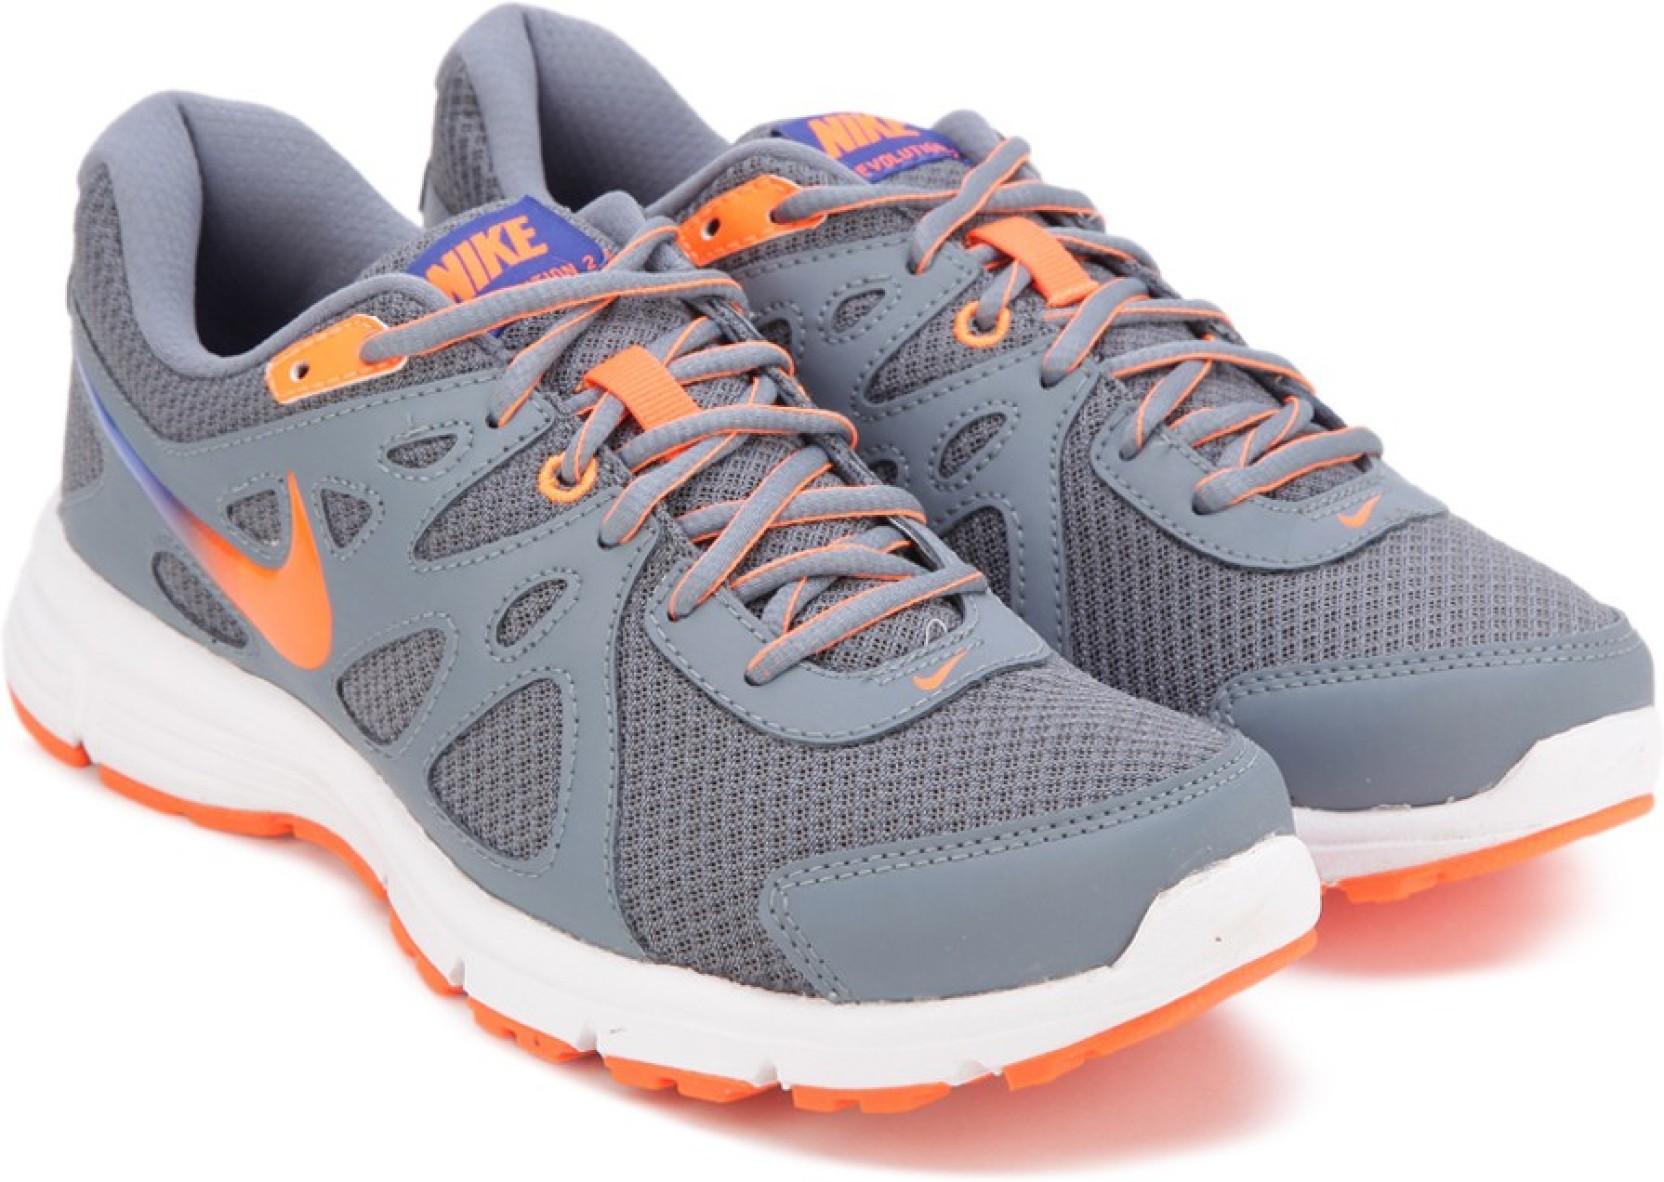 0a2423f77e3 ... denmark nike revolution 2 msl running shoes for men. big diwali sale  ends in01 days